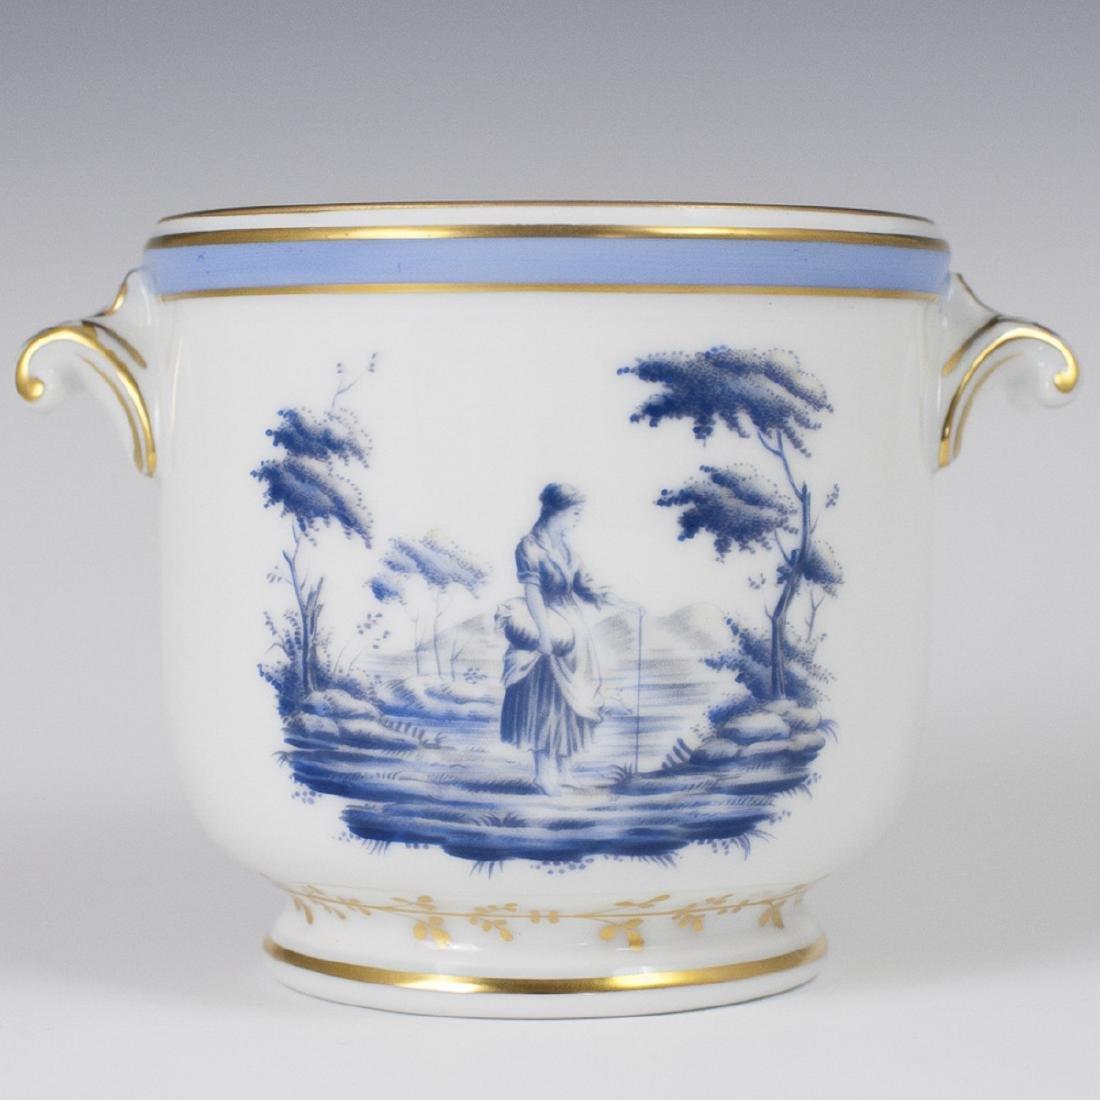 Richard Ginori Porcelain Cachepot